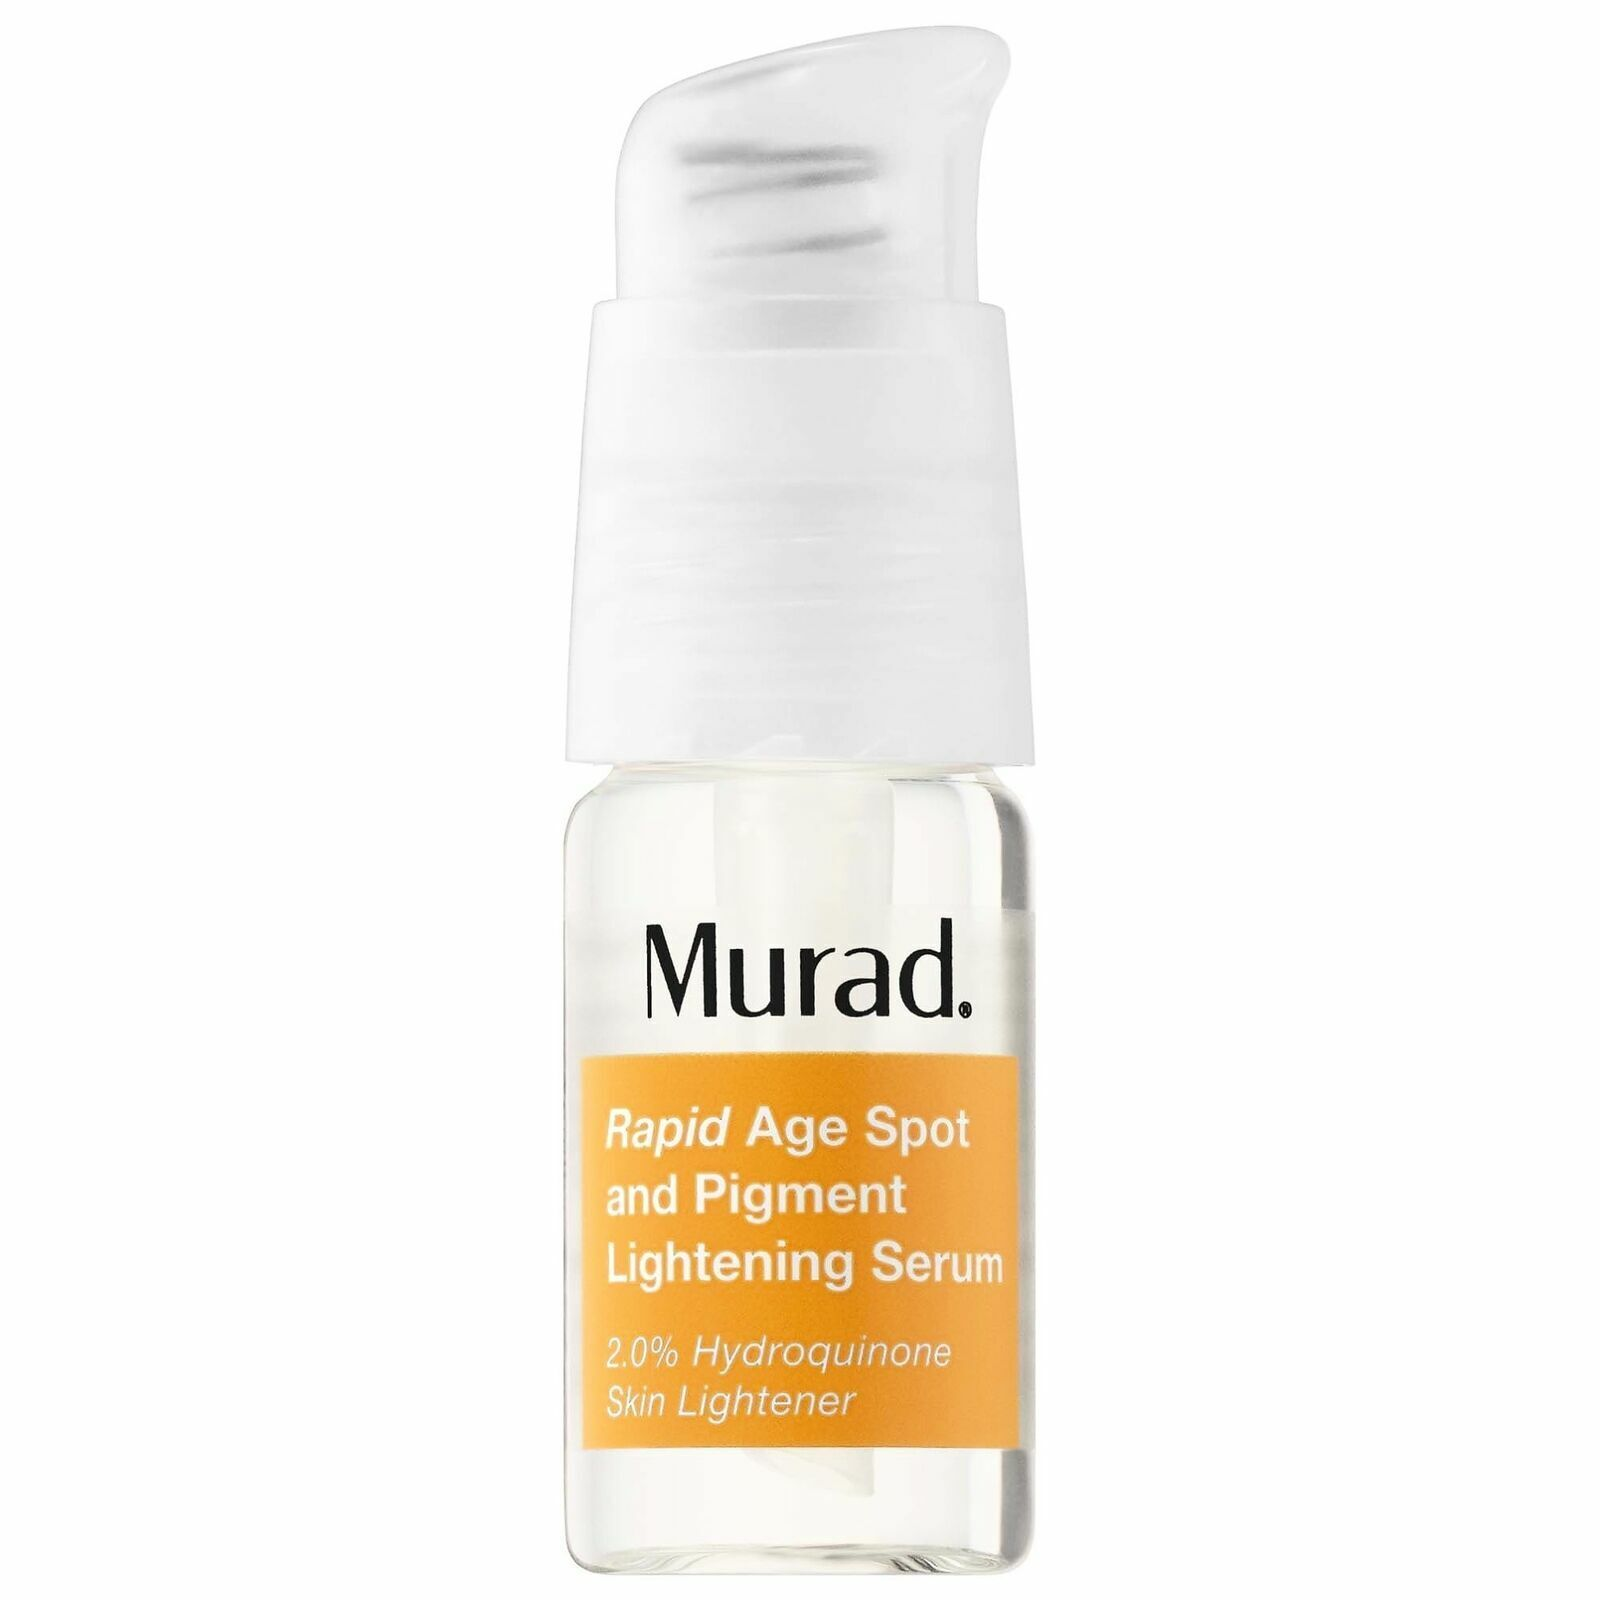 rapid age spot and pigment lightening serum